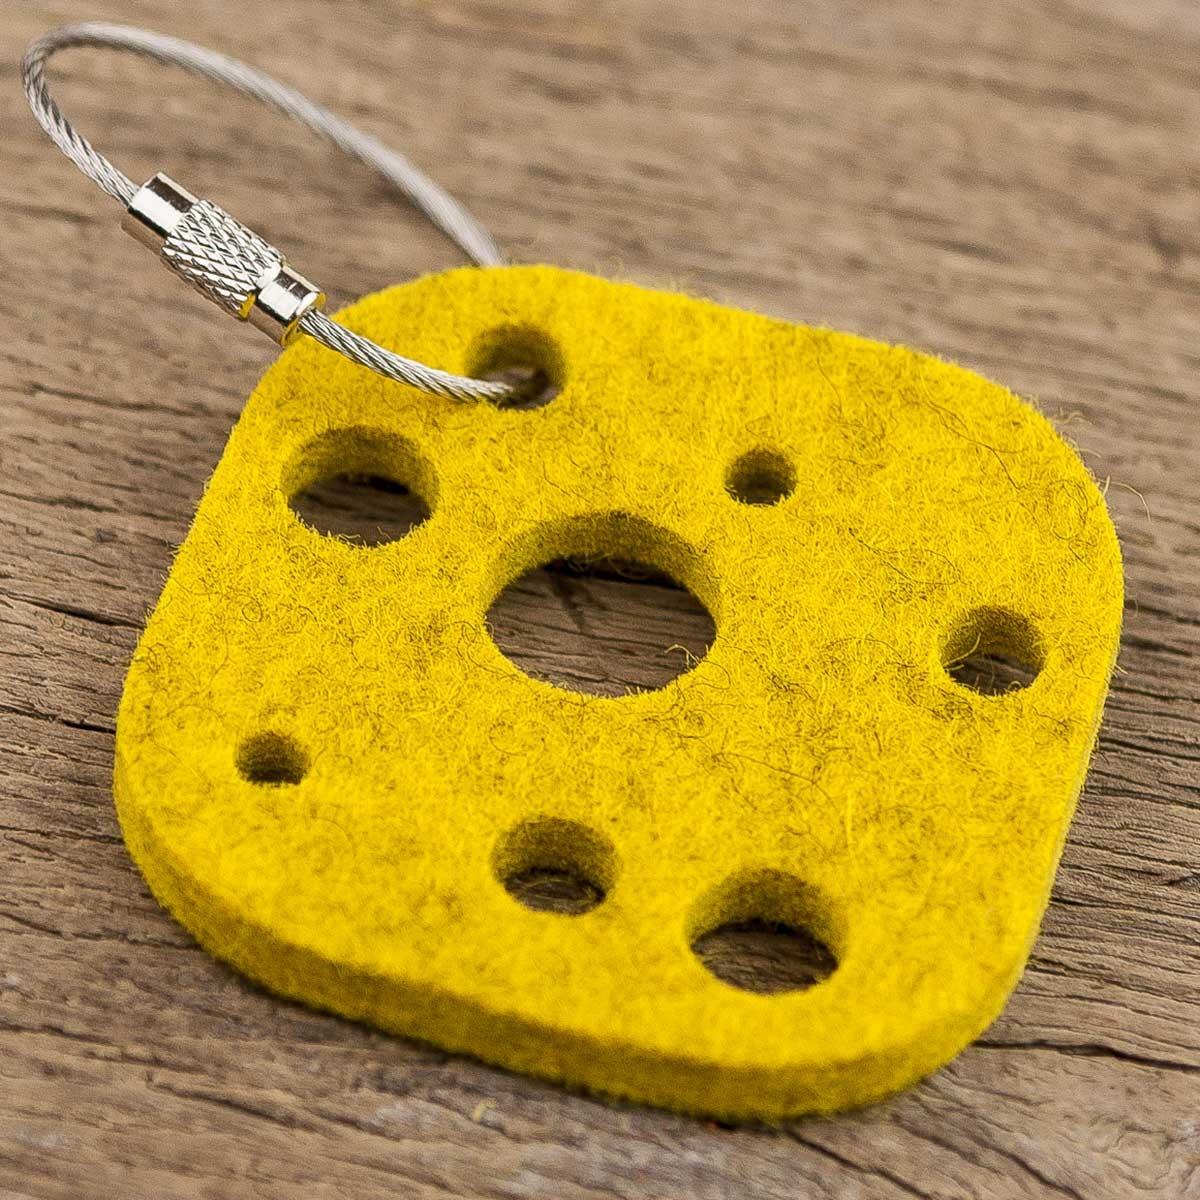 Filz Schlüsselanhänger Käse, gelb – auch als Geschenkanhänger